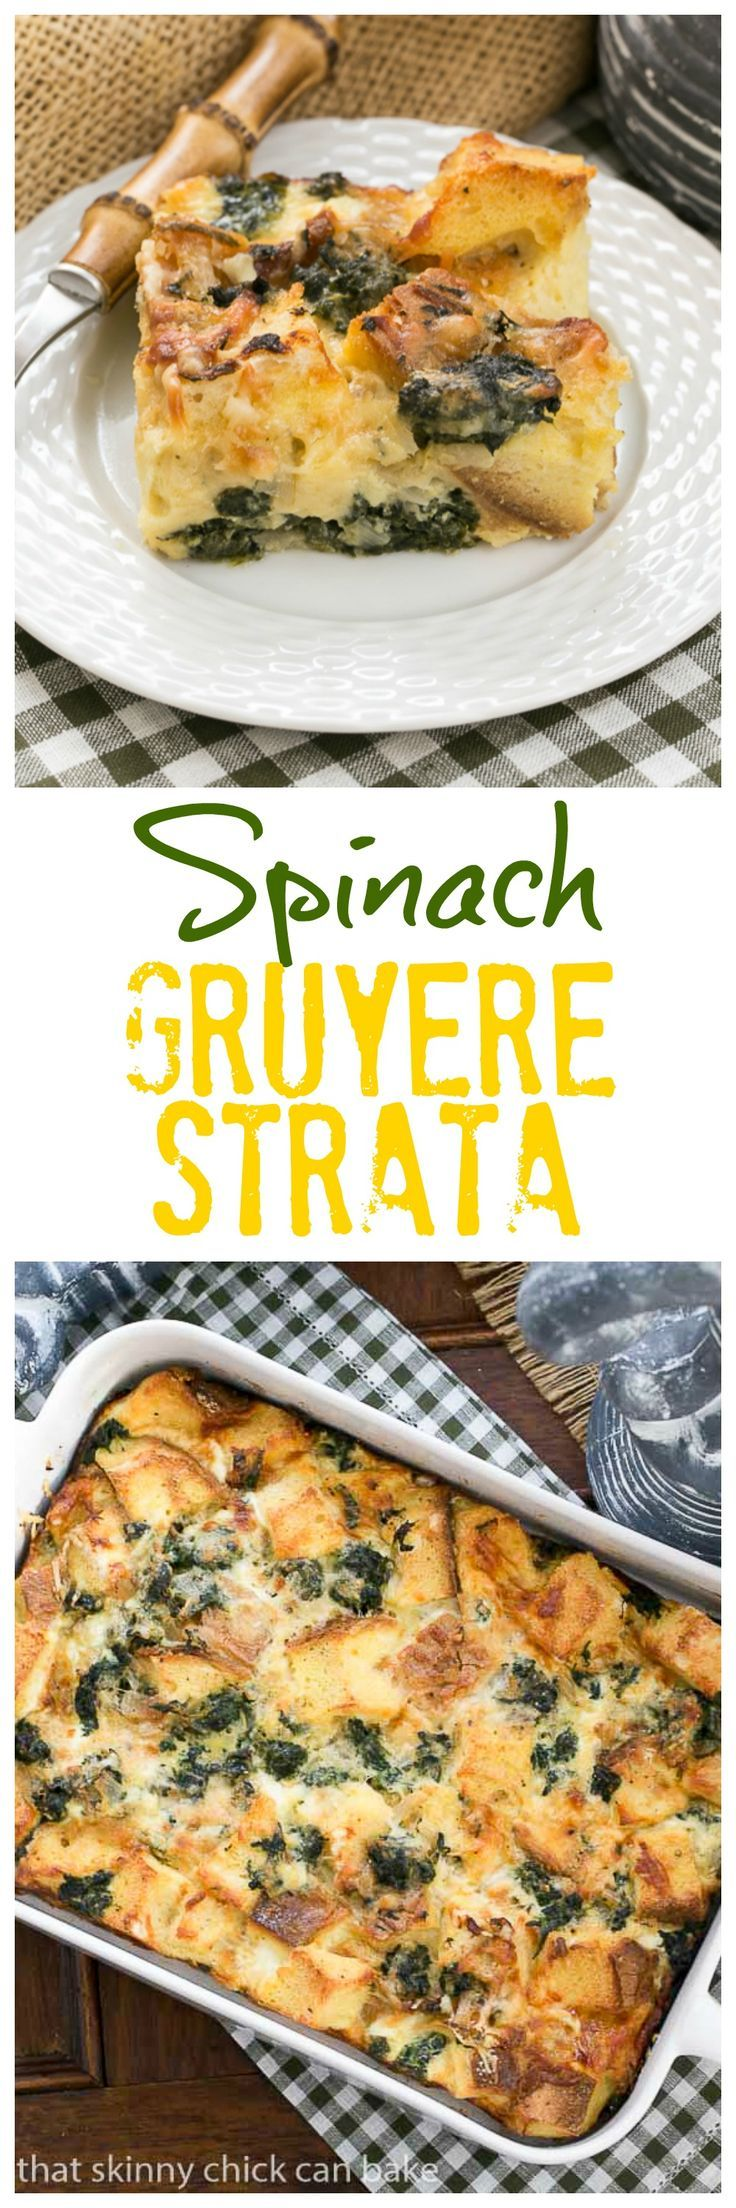 Gruyere Spinach Strata | A terrific cheesy breakfast casserole made with bread, Swiss Gruyere and spinach! #breakfast #brunch #casserole